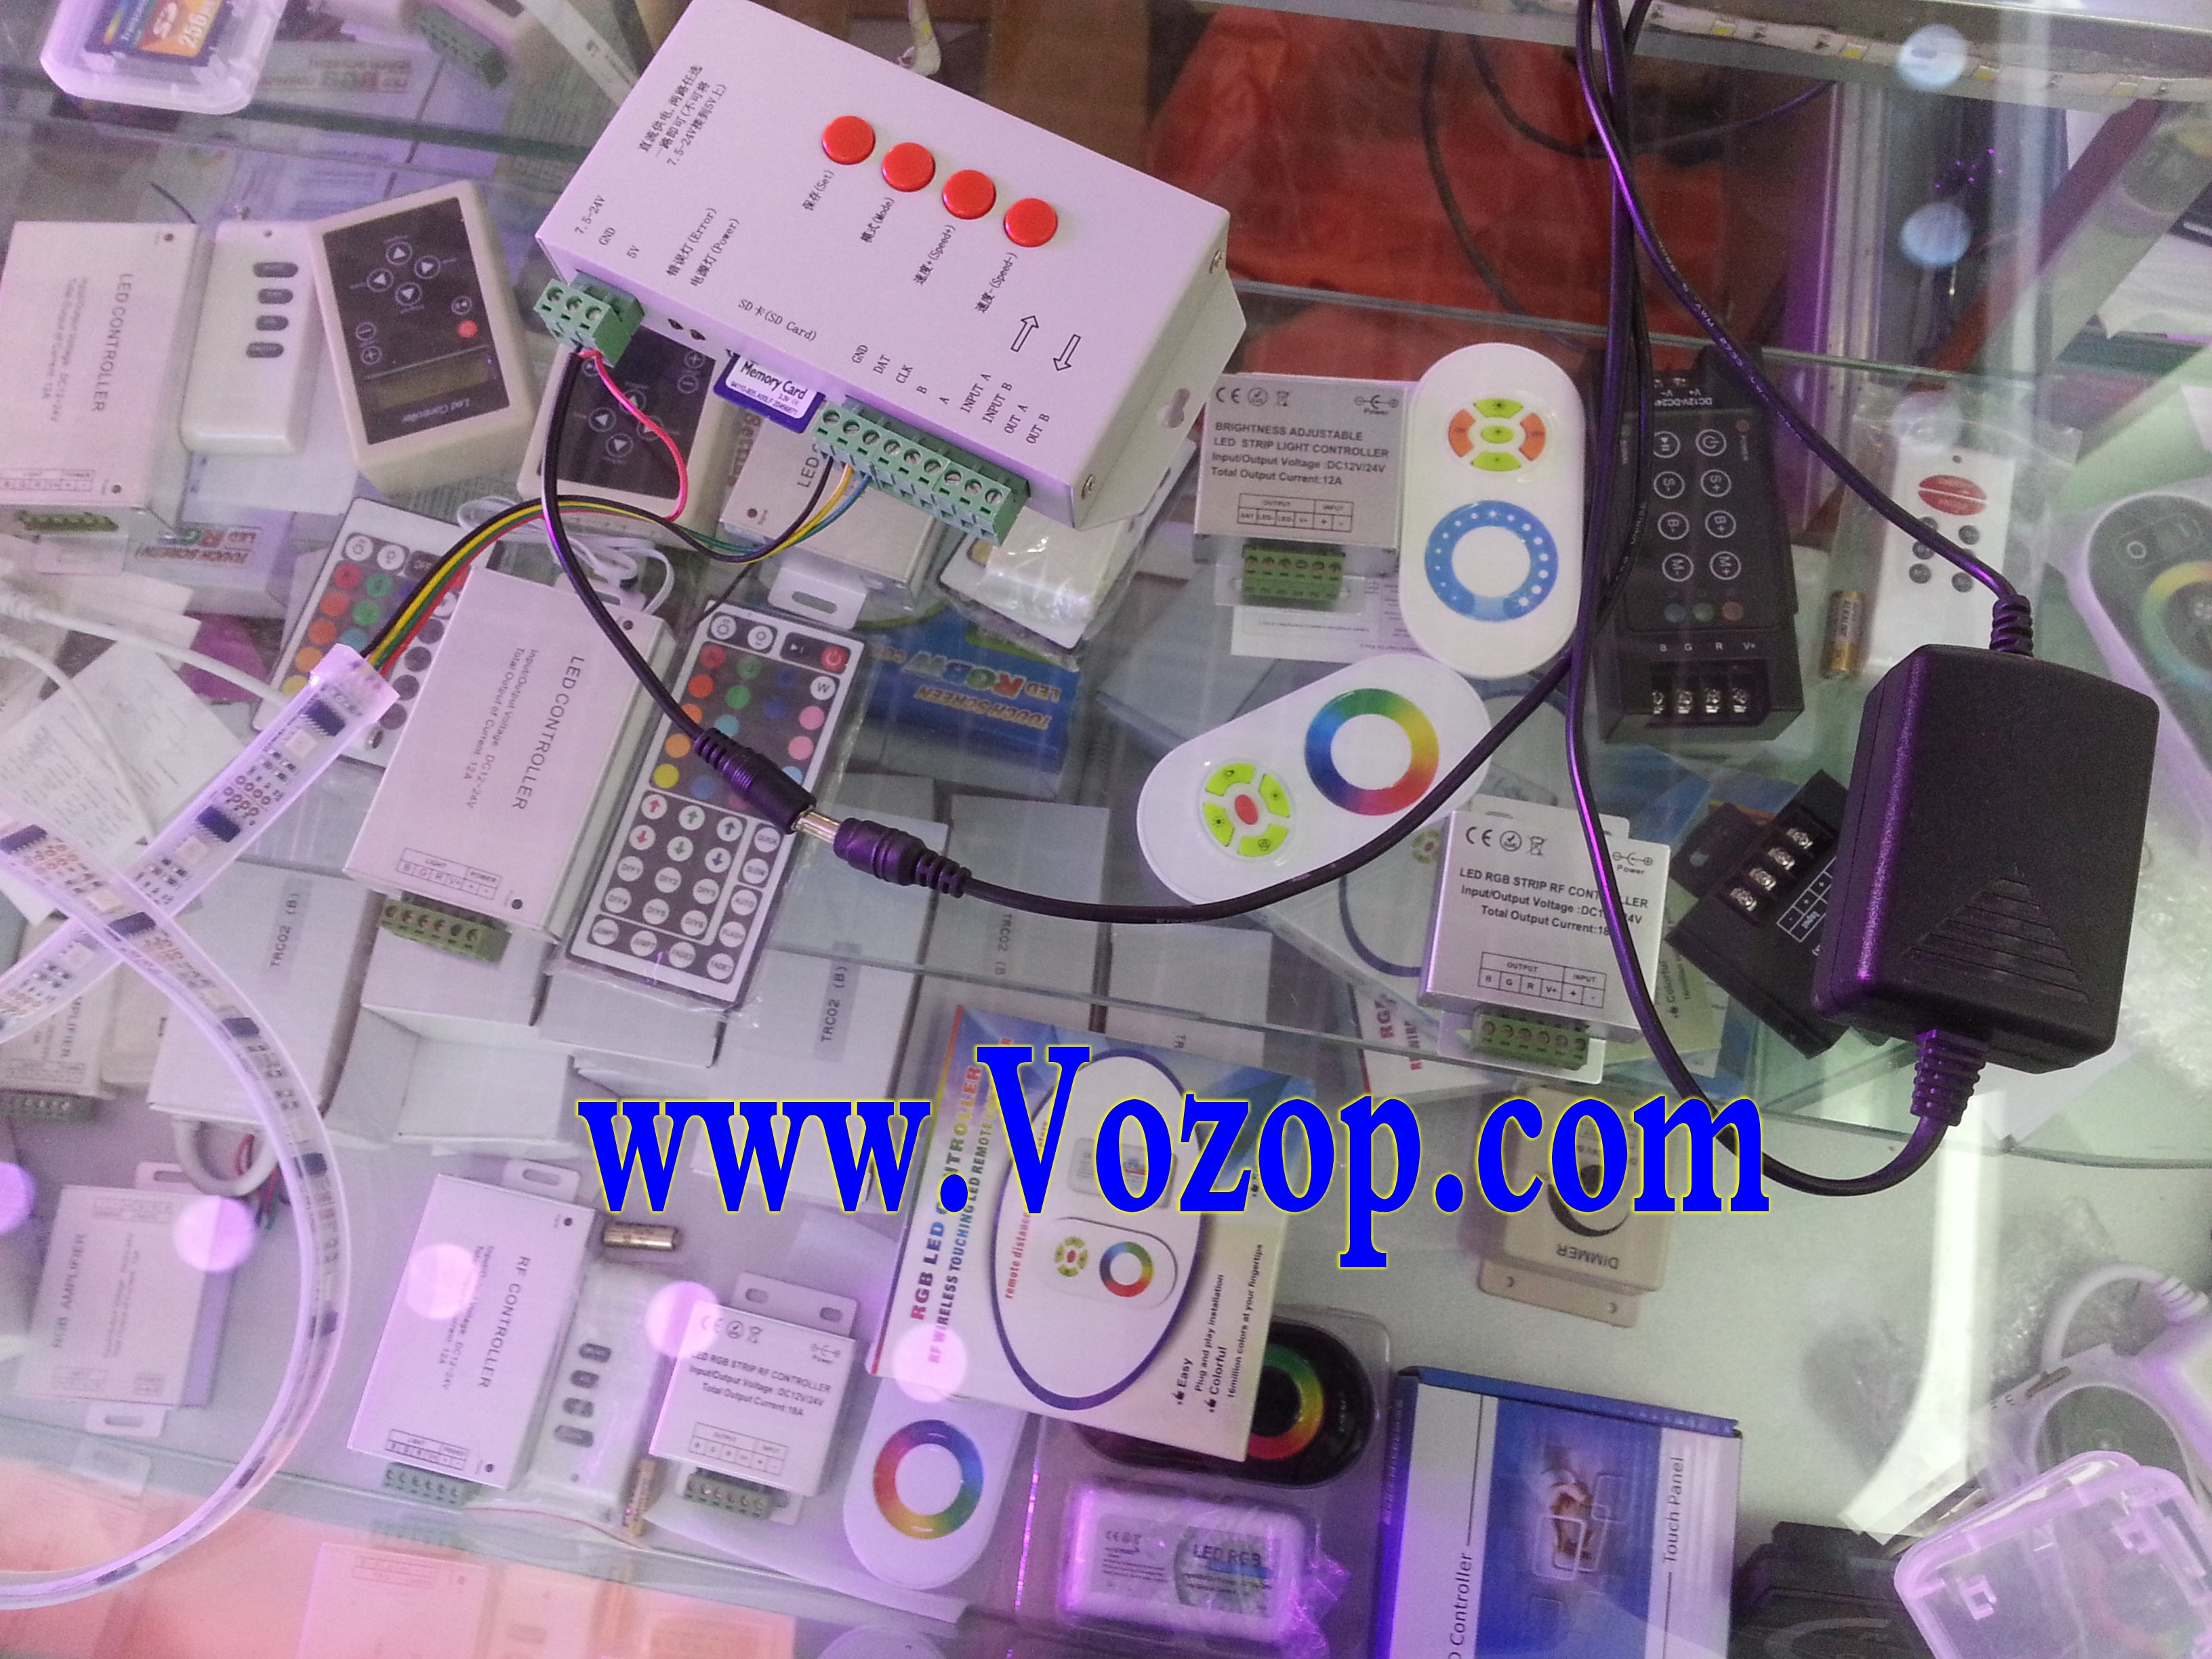 WS2801_Digital_Strip_5_Meters_16.4_Feet_DC_5V_Smart_LED_Tape_Ribbon_Rope_Lights